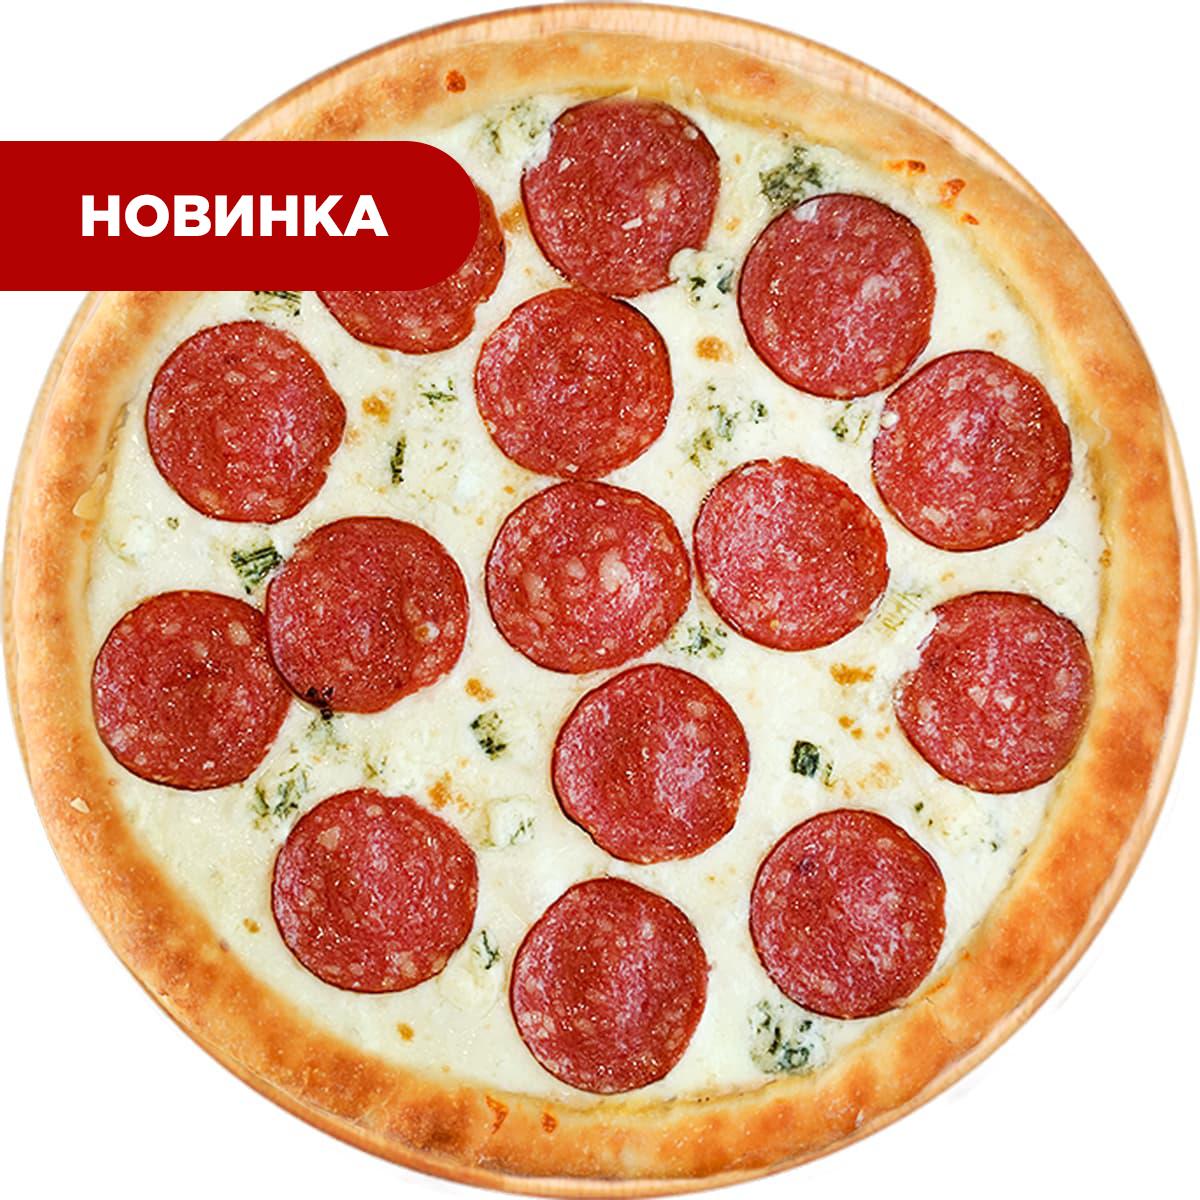 пицца блю чиз новинка